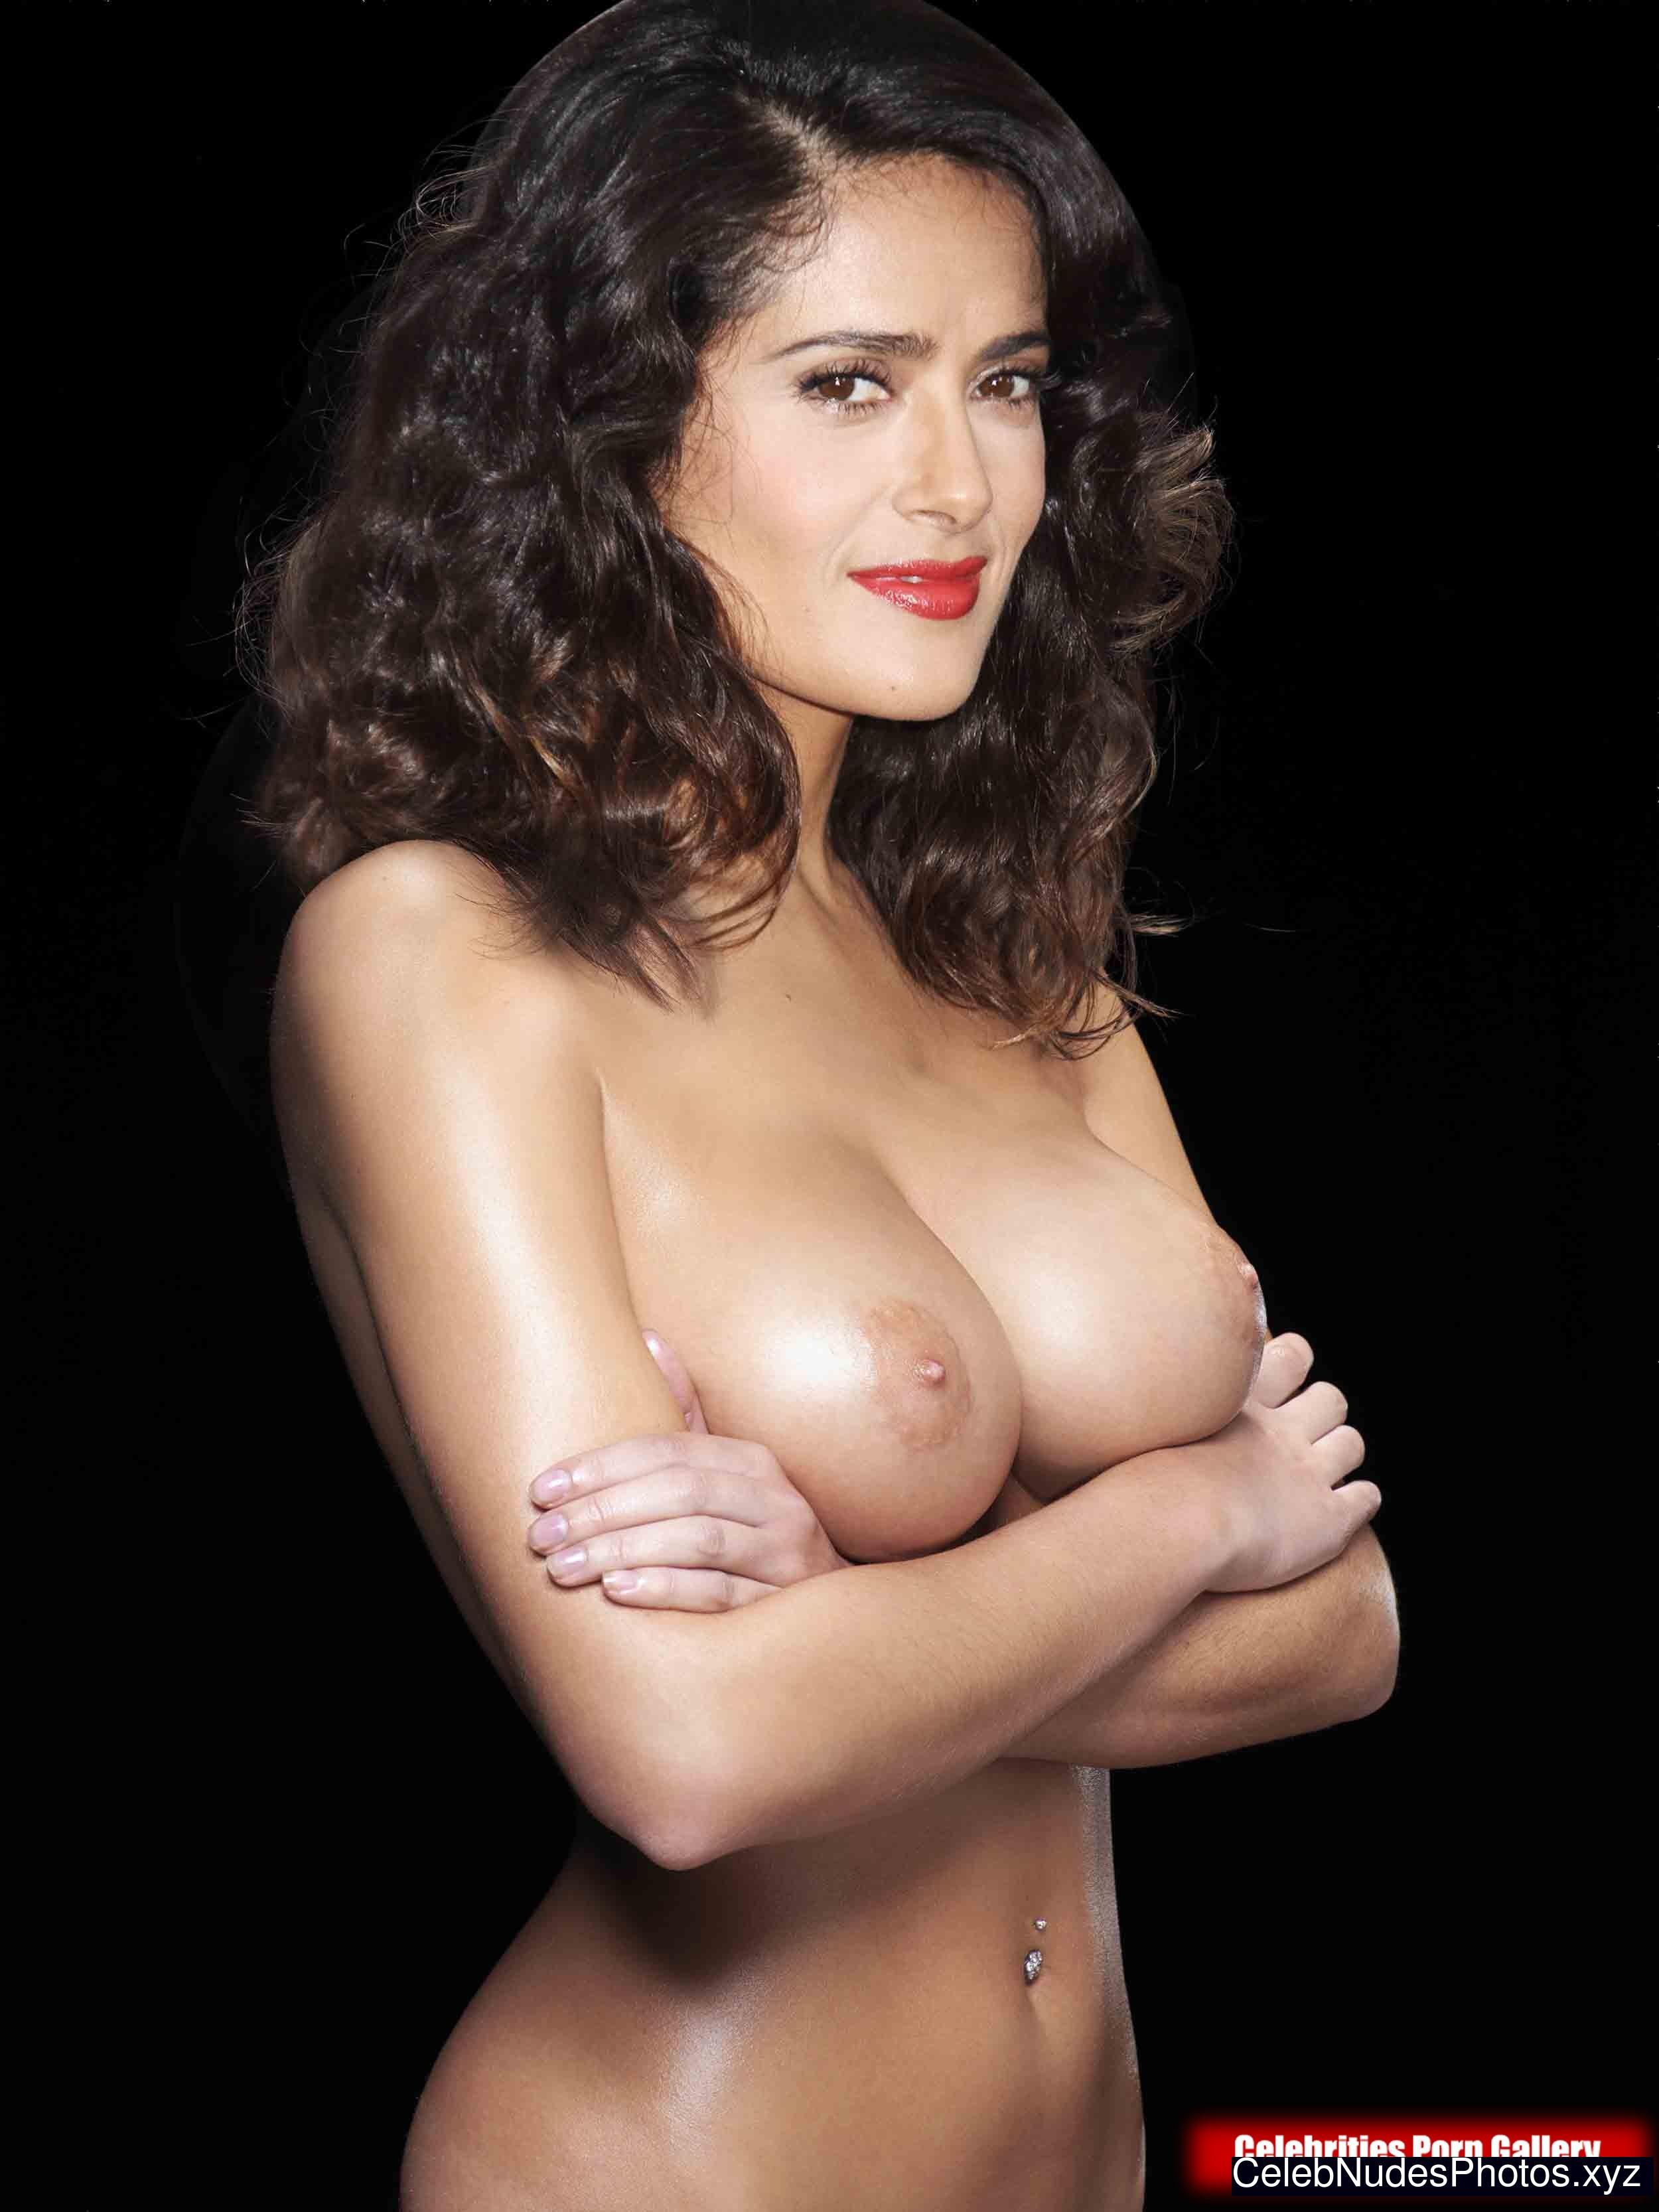 Vietnam sexy girl big nipple nude